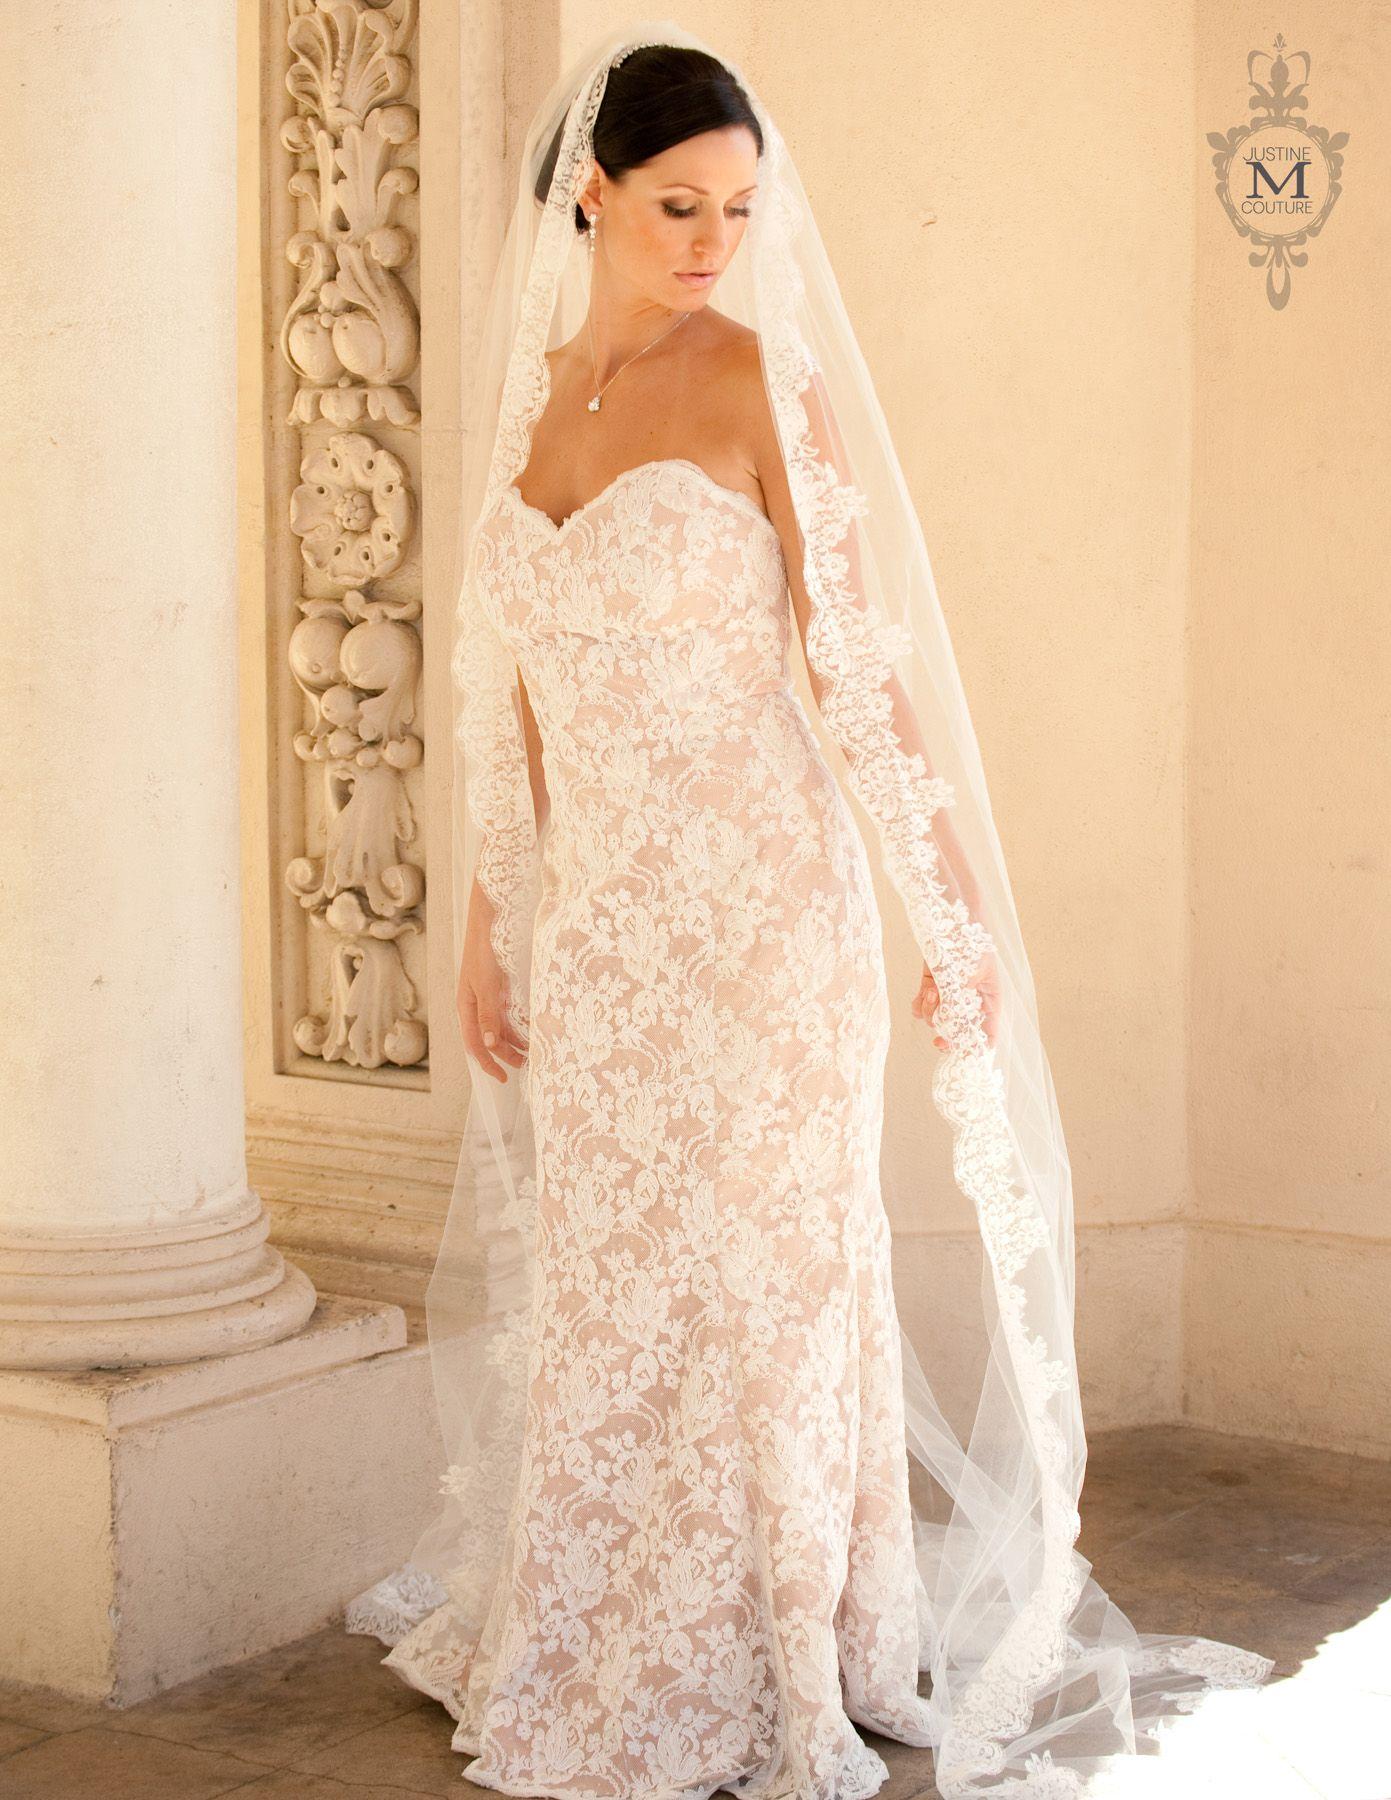 Wedding dress jewelry  Kimberly u Justine M Couture Bridal Veils Jewelry and Accessories